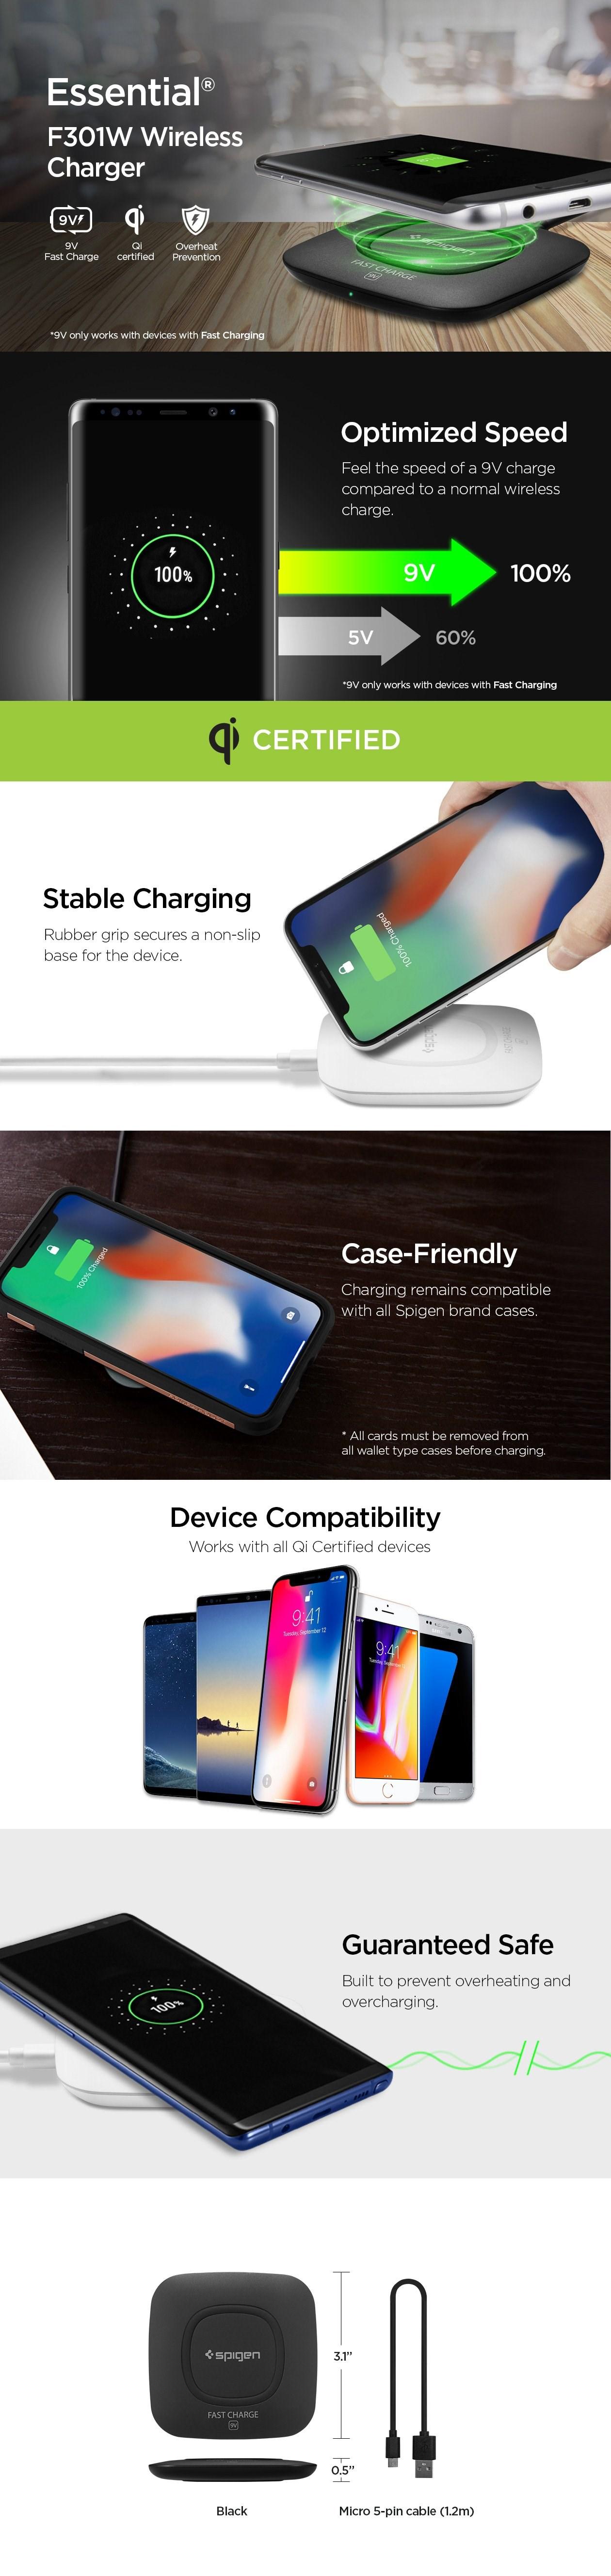 SPIGEN - F301W Wireless Charger Case Compatible White (000CH22588)